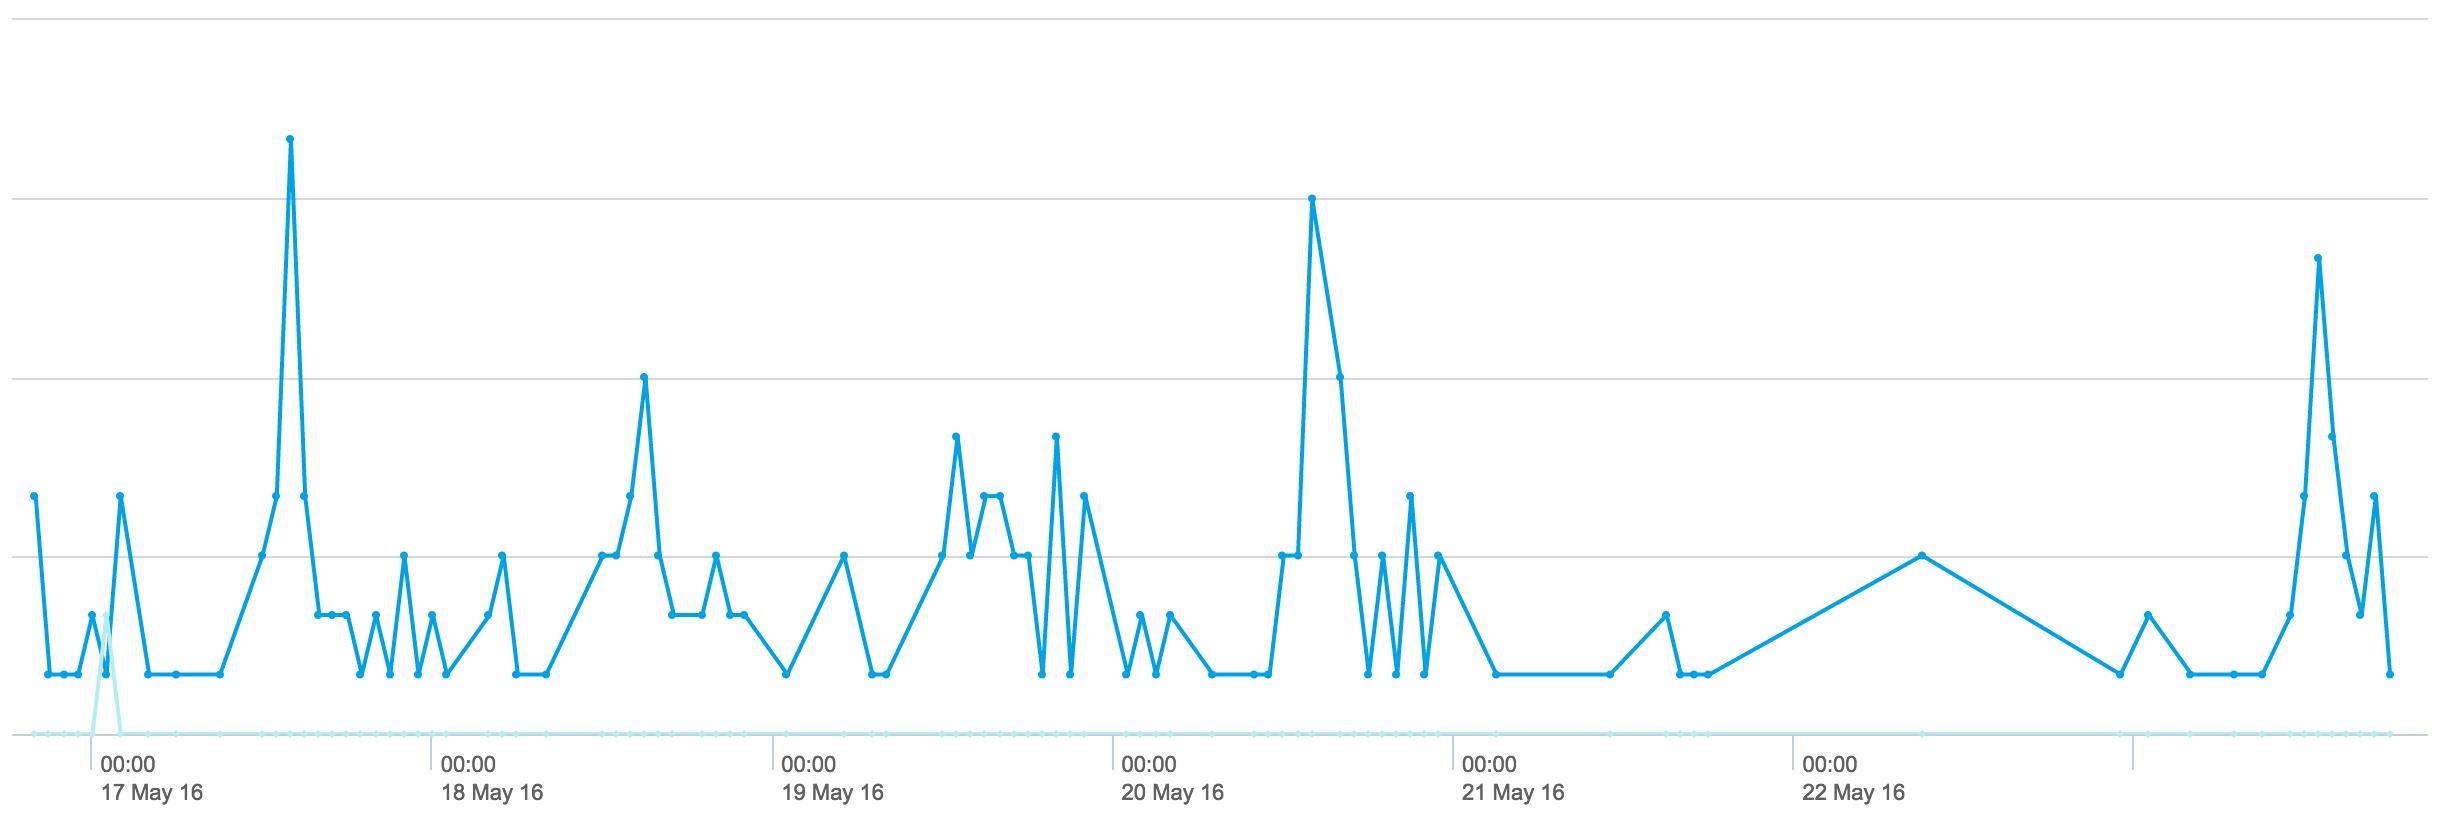 Sumo Logic trend chart sample